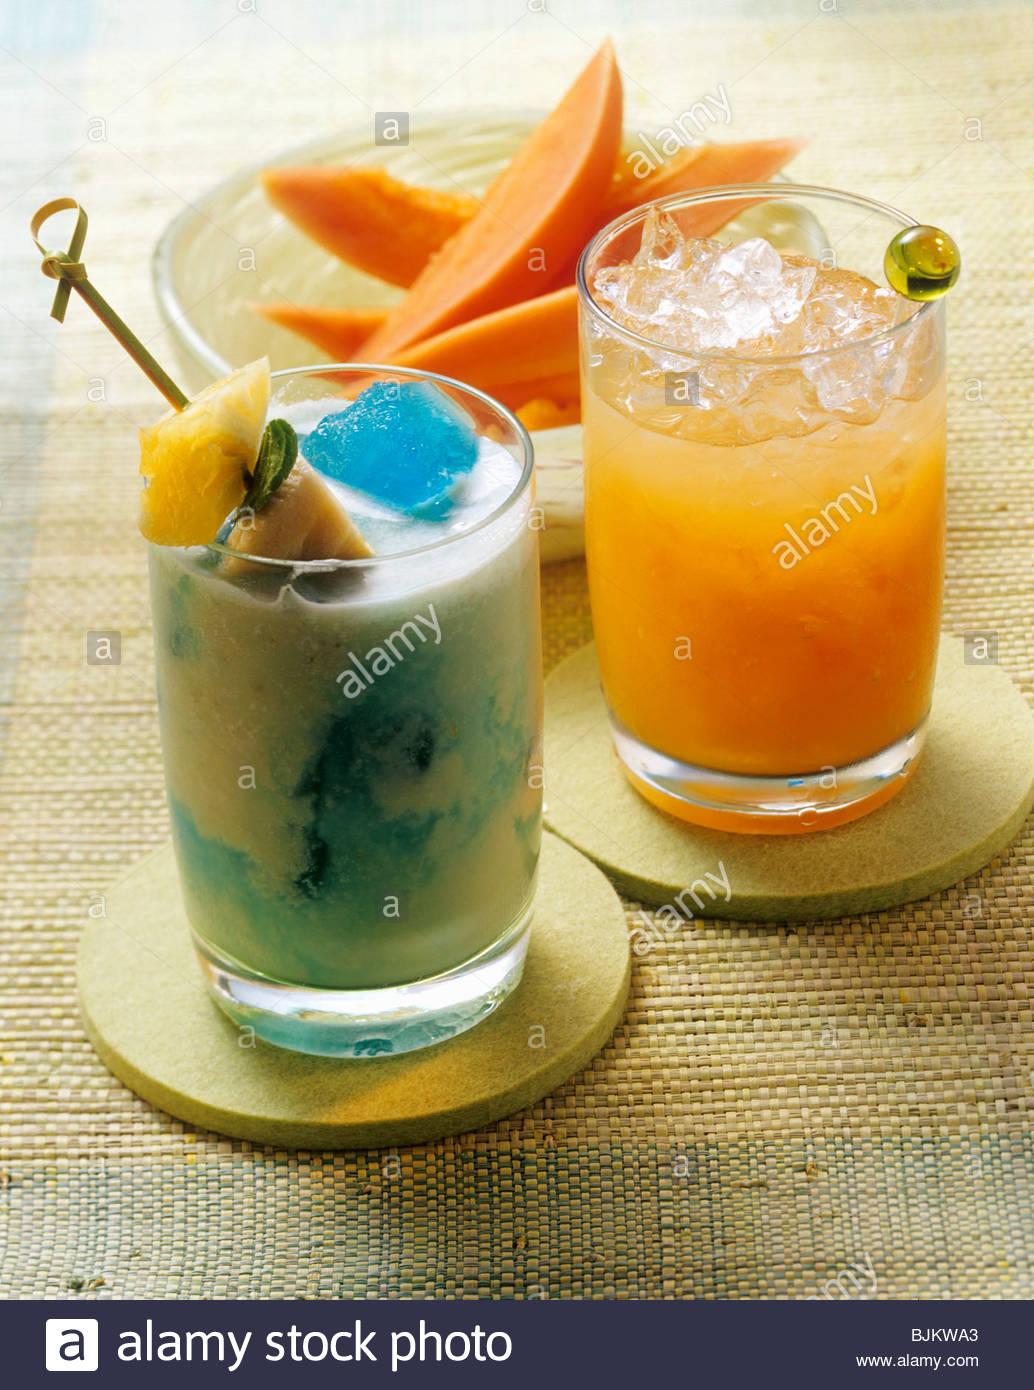 Tijuana Banana Boat (tequila drink), Pa & Ma (vodka drink) - Stock Image